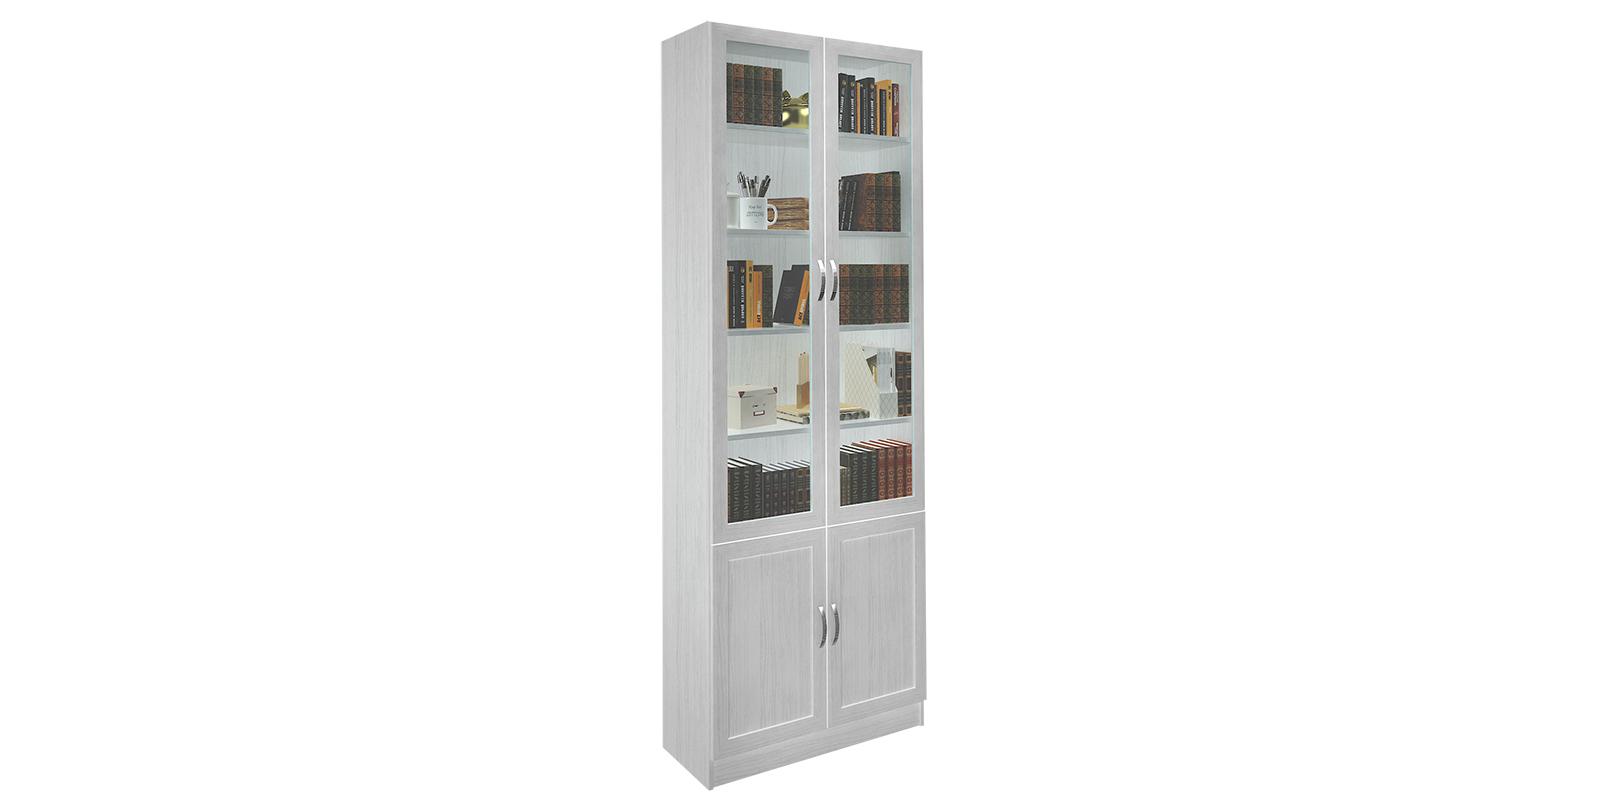 Шкаф распашной четырехдверный жаклин (дуб феррара/белый глян.